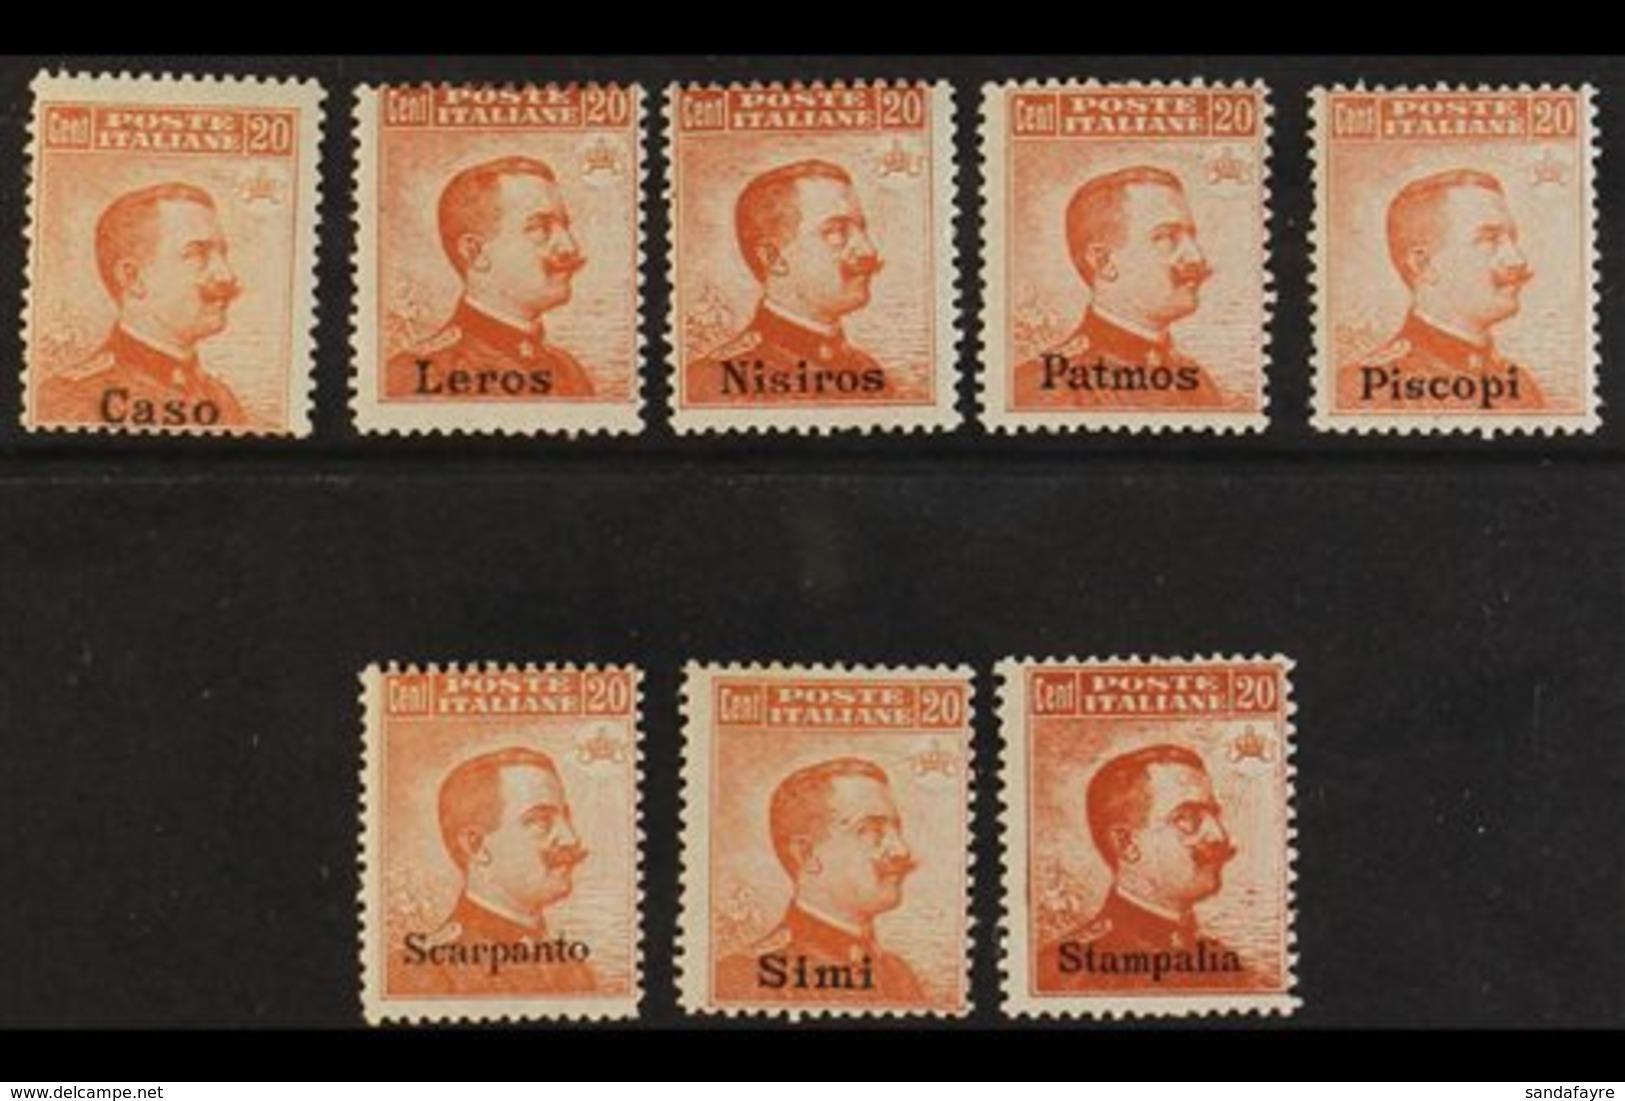 1917 20c Orange, No Watermark Ovptd Issues From Caso, Leros, Nisiros, Patmos, Piscopi, Scarpanto, Simi & Stampalia, Sass - Egée